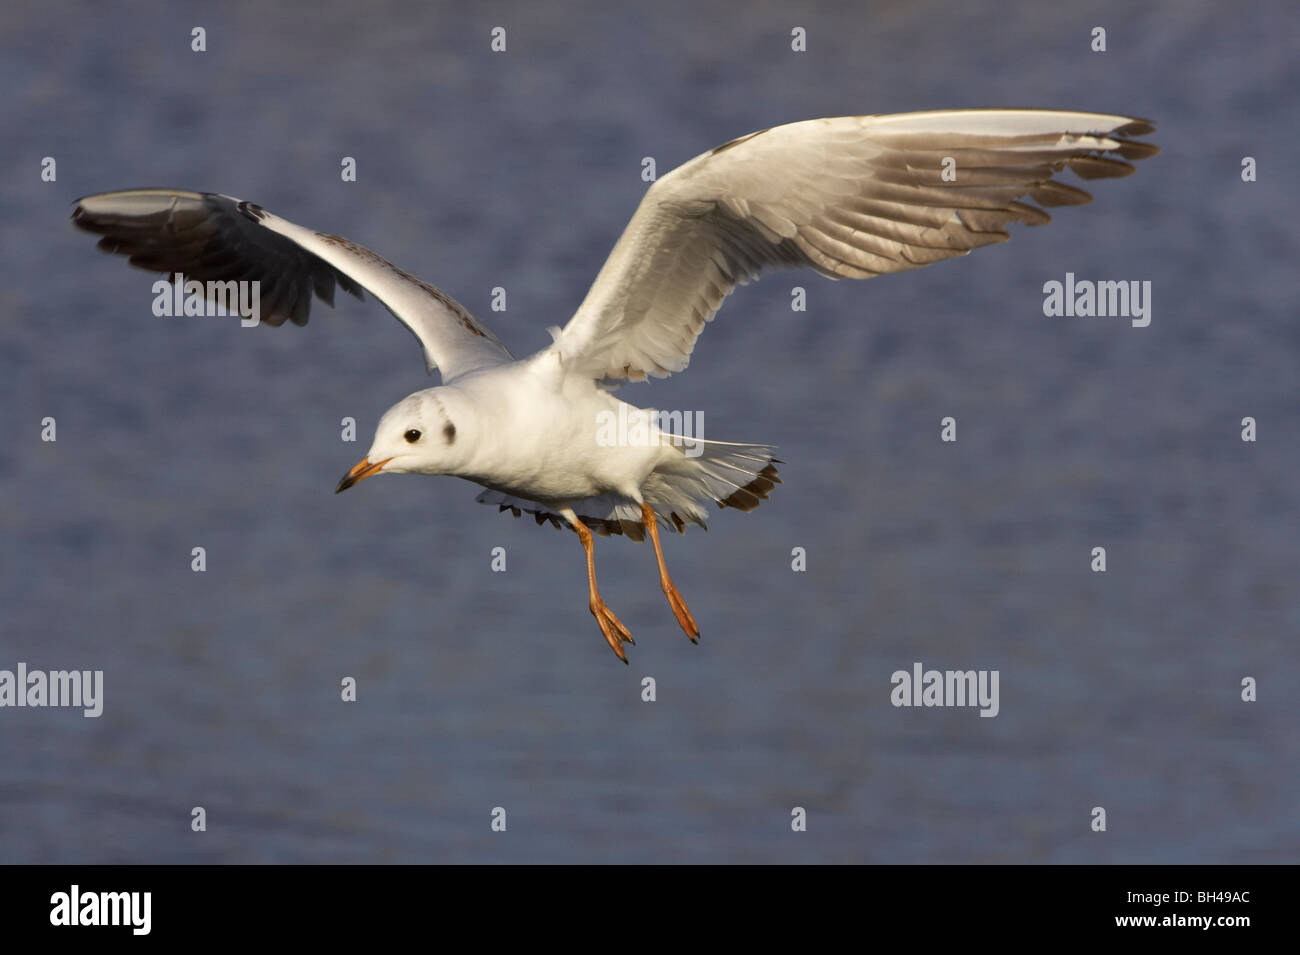 Black-headed gull (Larus ridibundus) in flight. Stock Photo